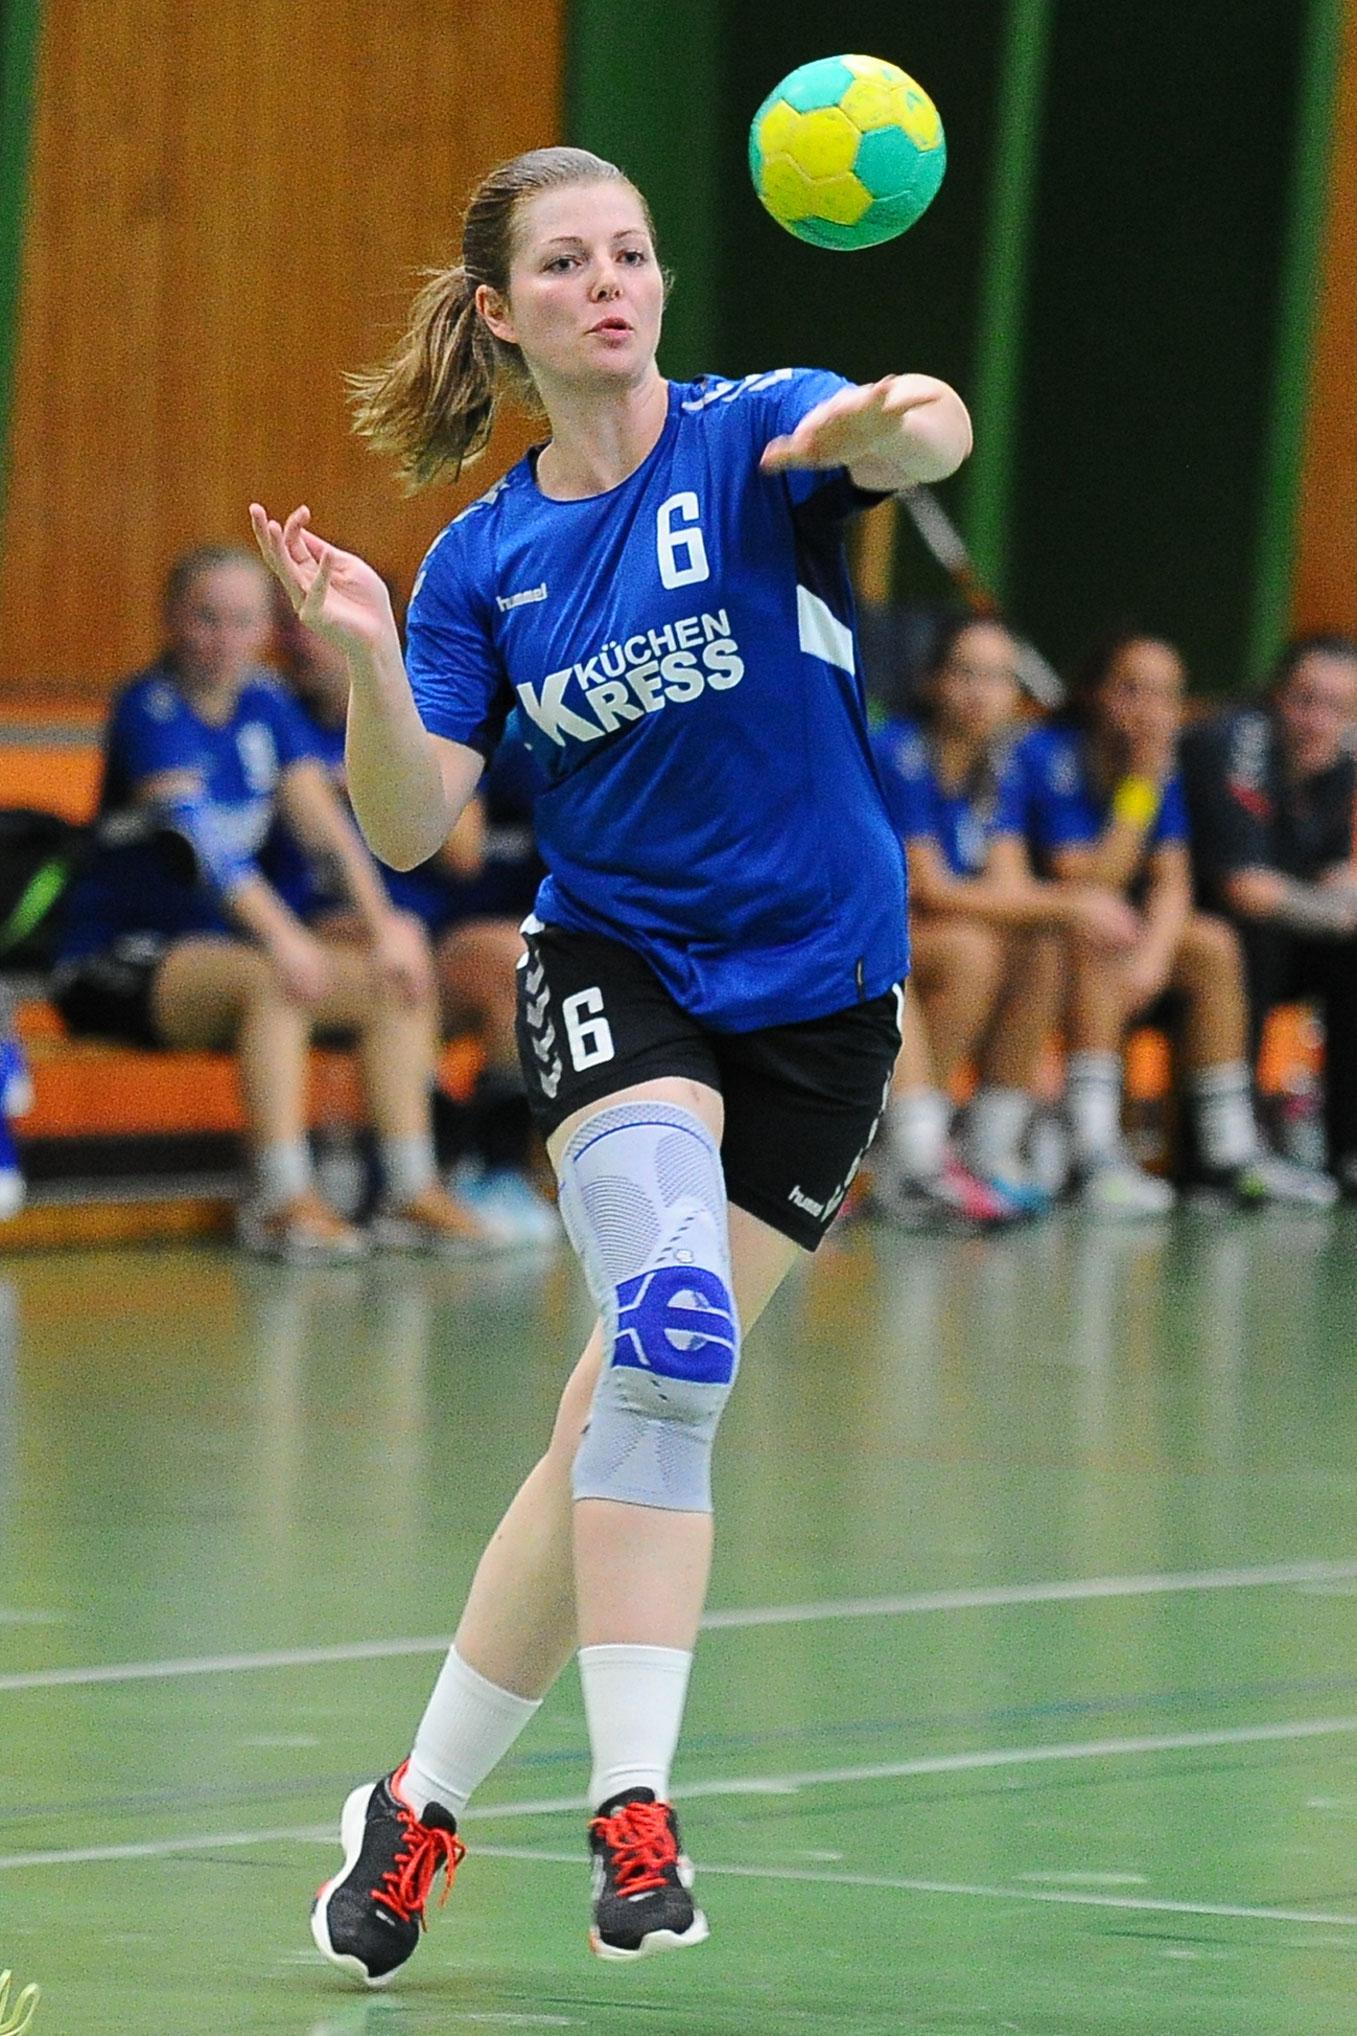 Handball Wm Damen Tv übertragung